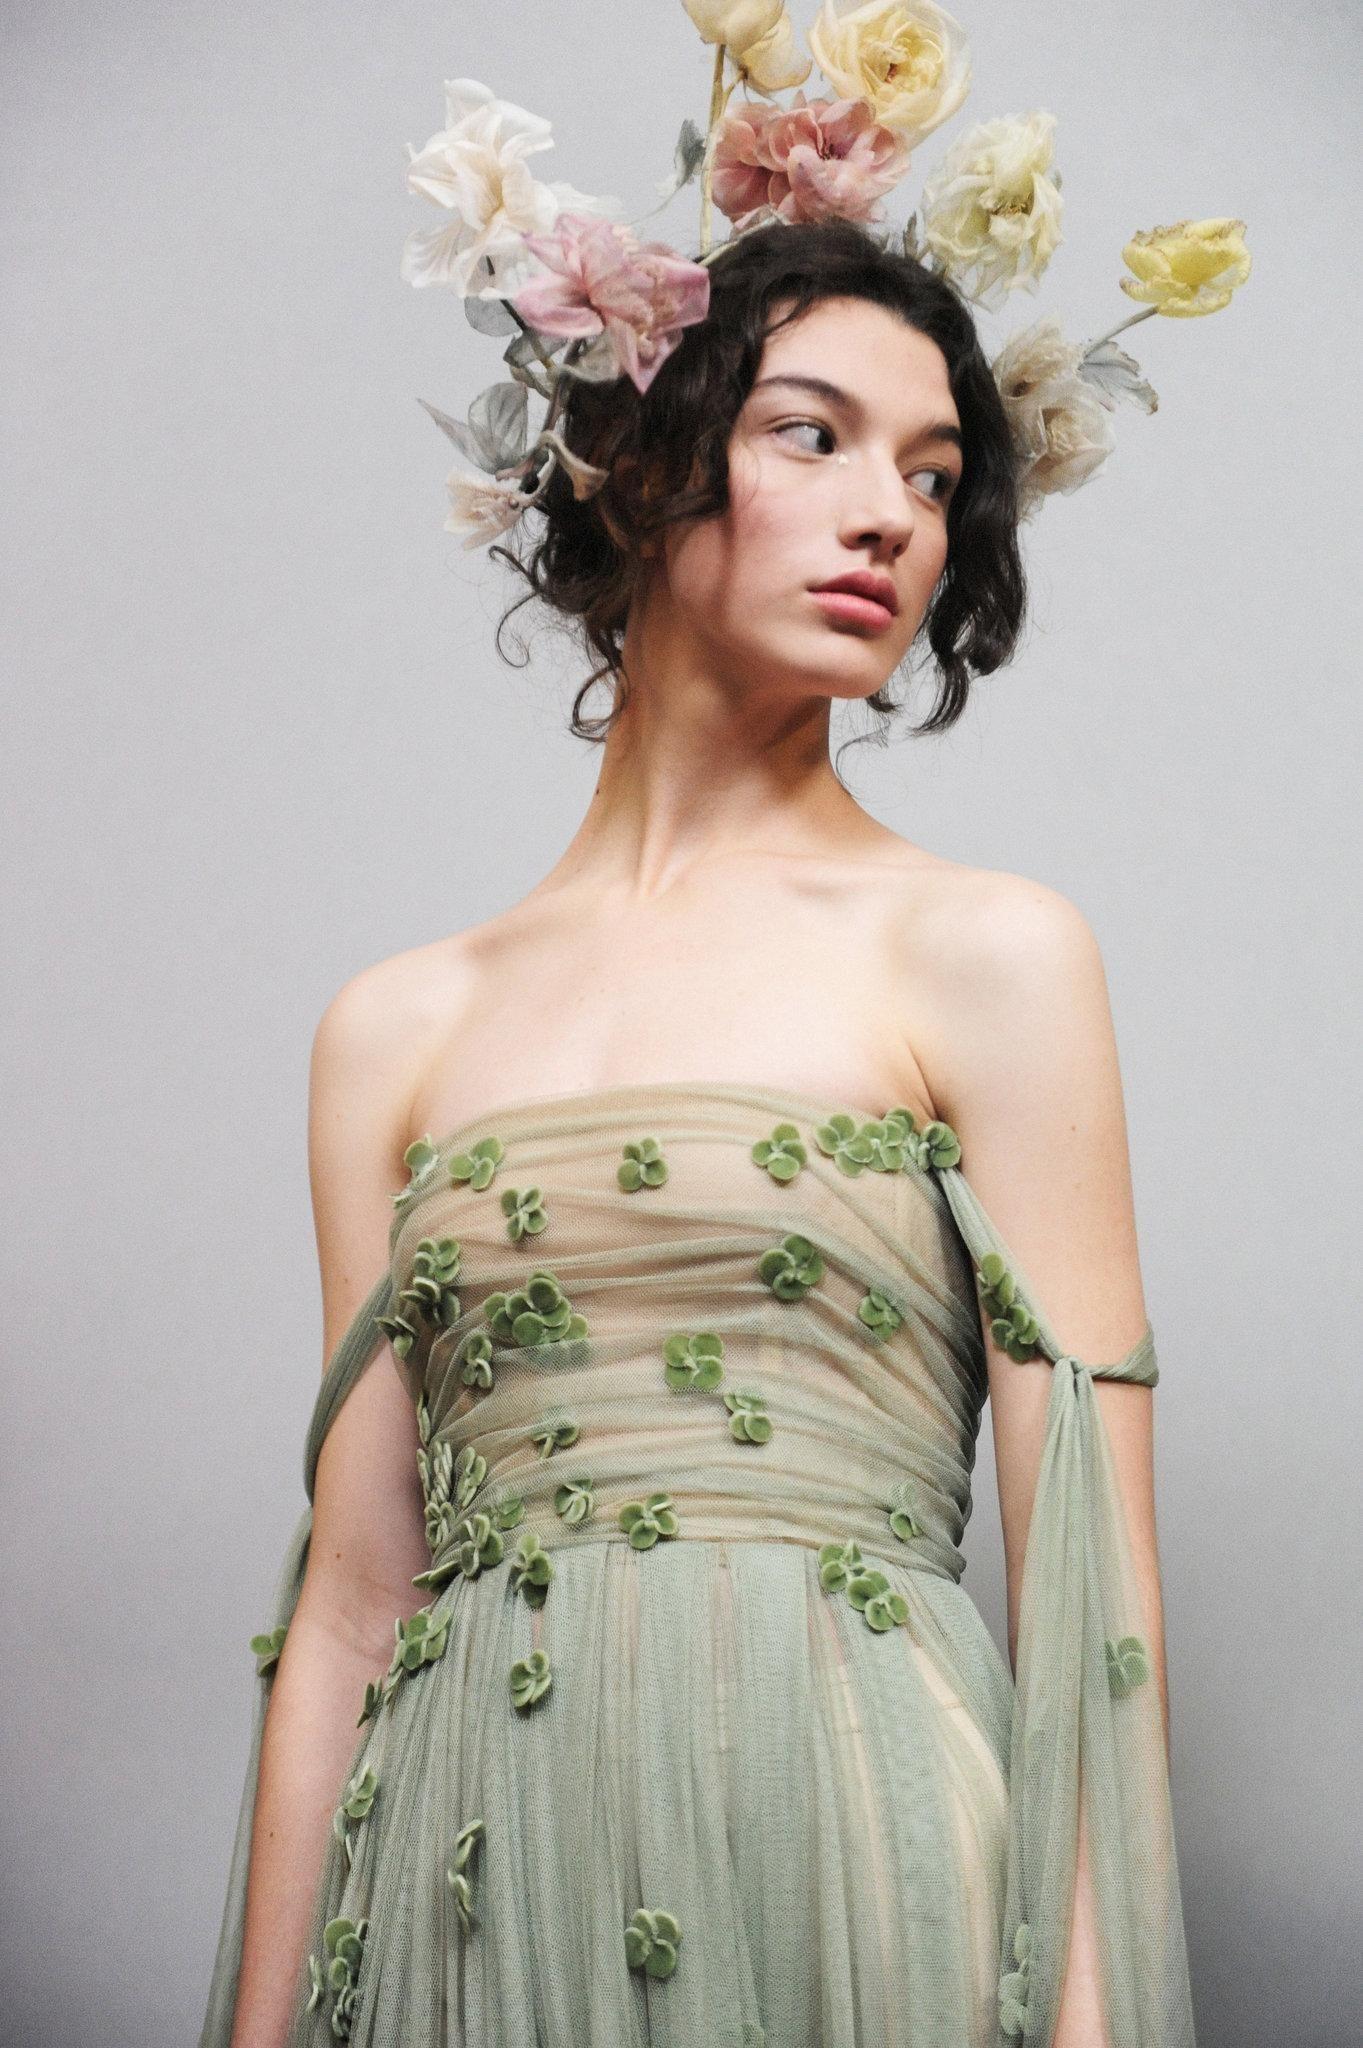 eca2734a44f381 Couture Fashion Show: Christian Dior - The New York Times | Designer ...